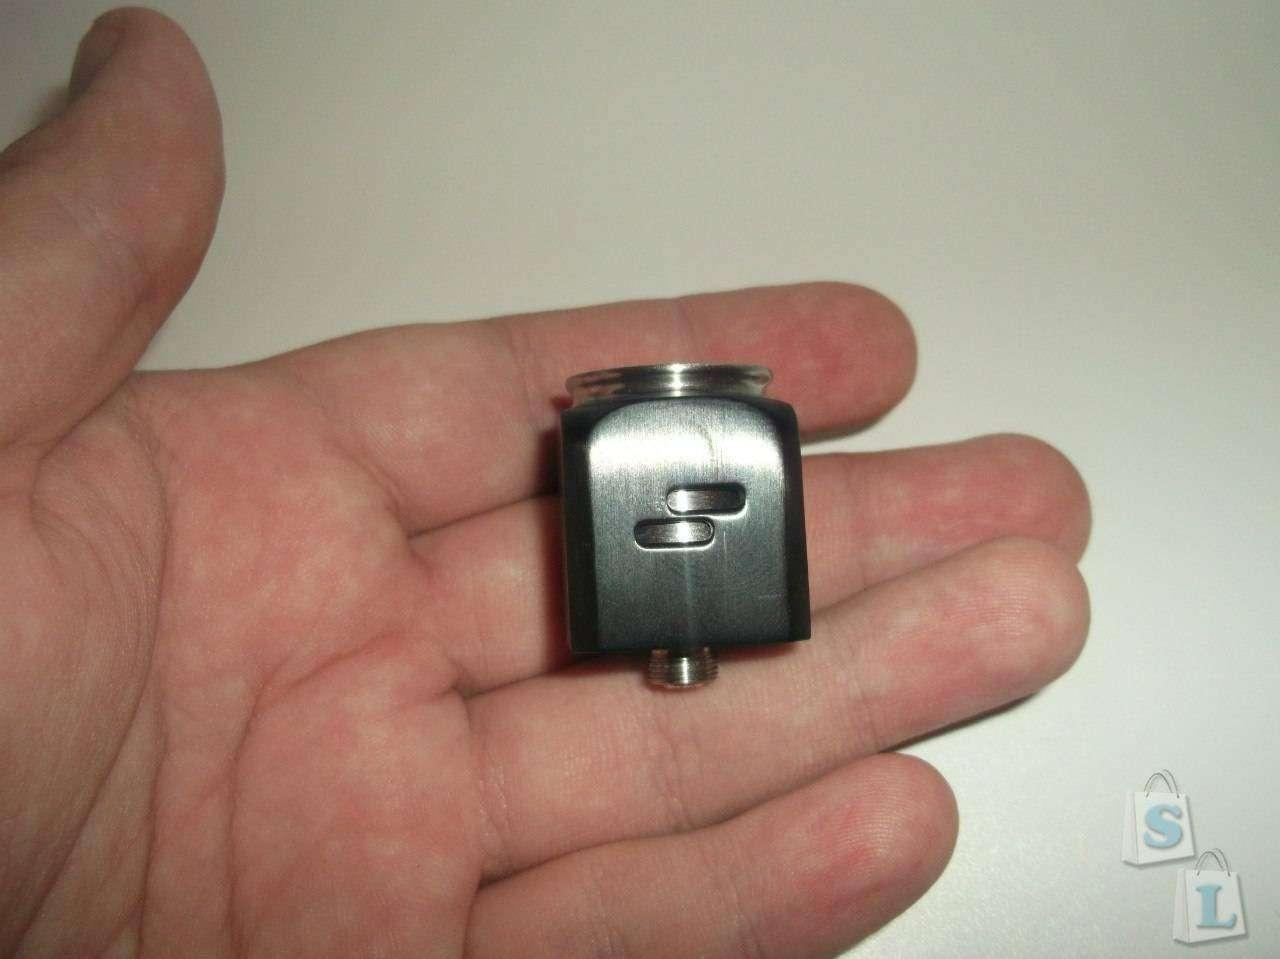 GearBest: Необычная электронная сигарета. Wotofo Atty3 RDA Rebuildable Dripper и механический боксмод Cherry Bomber.